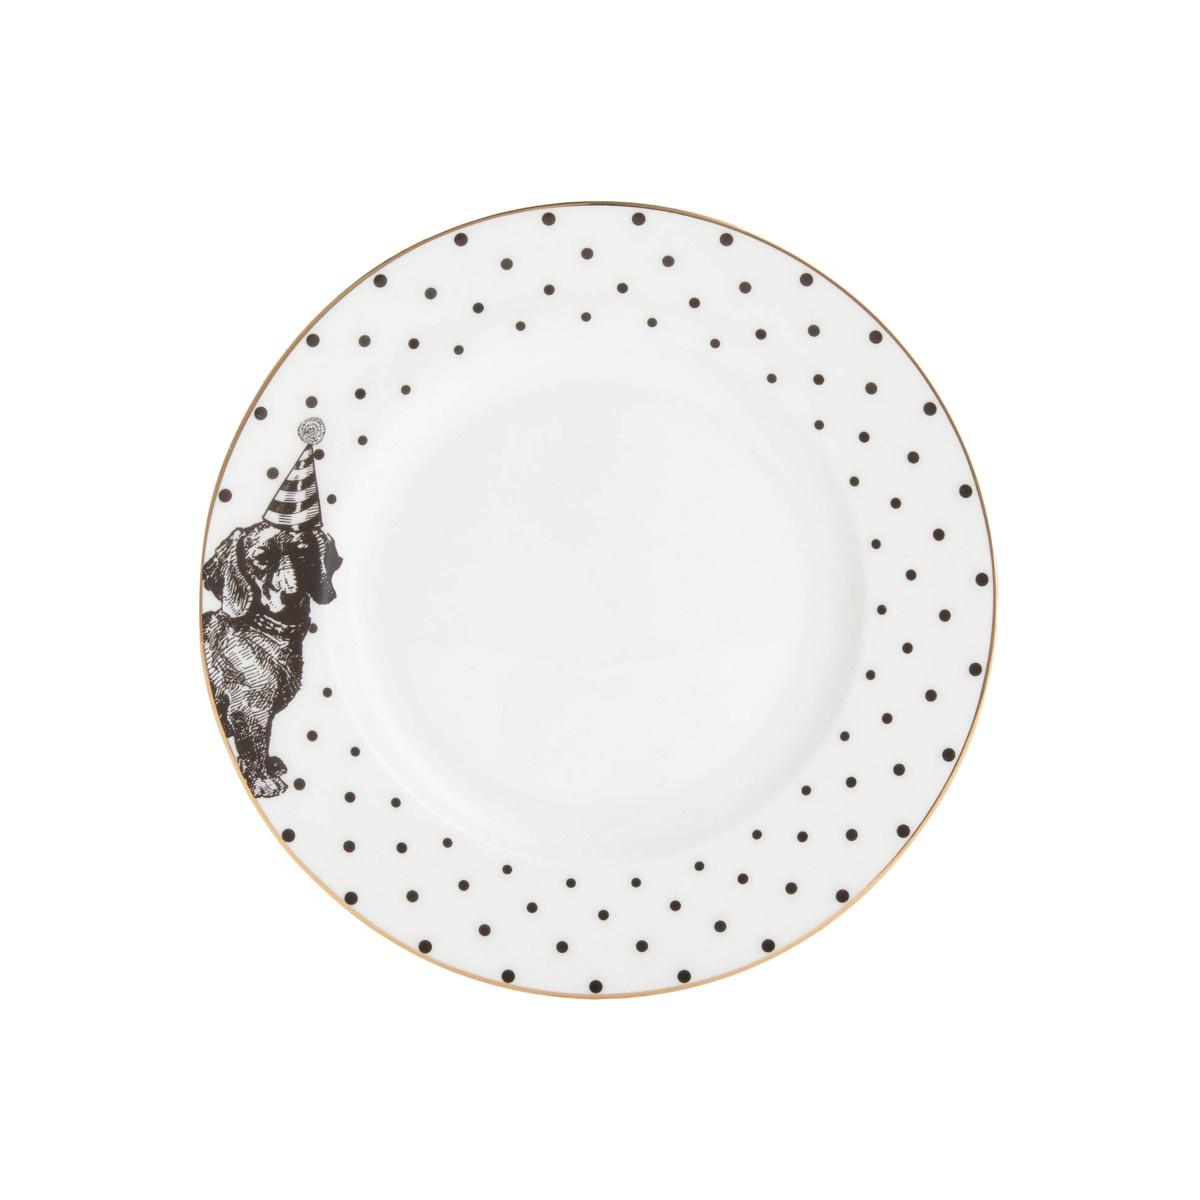 Yvonne Ellen London Monochrome Set van 2 Borden Ø 16 cm - Teckel - Bone China Porselein